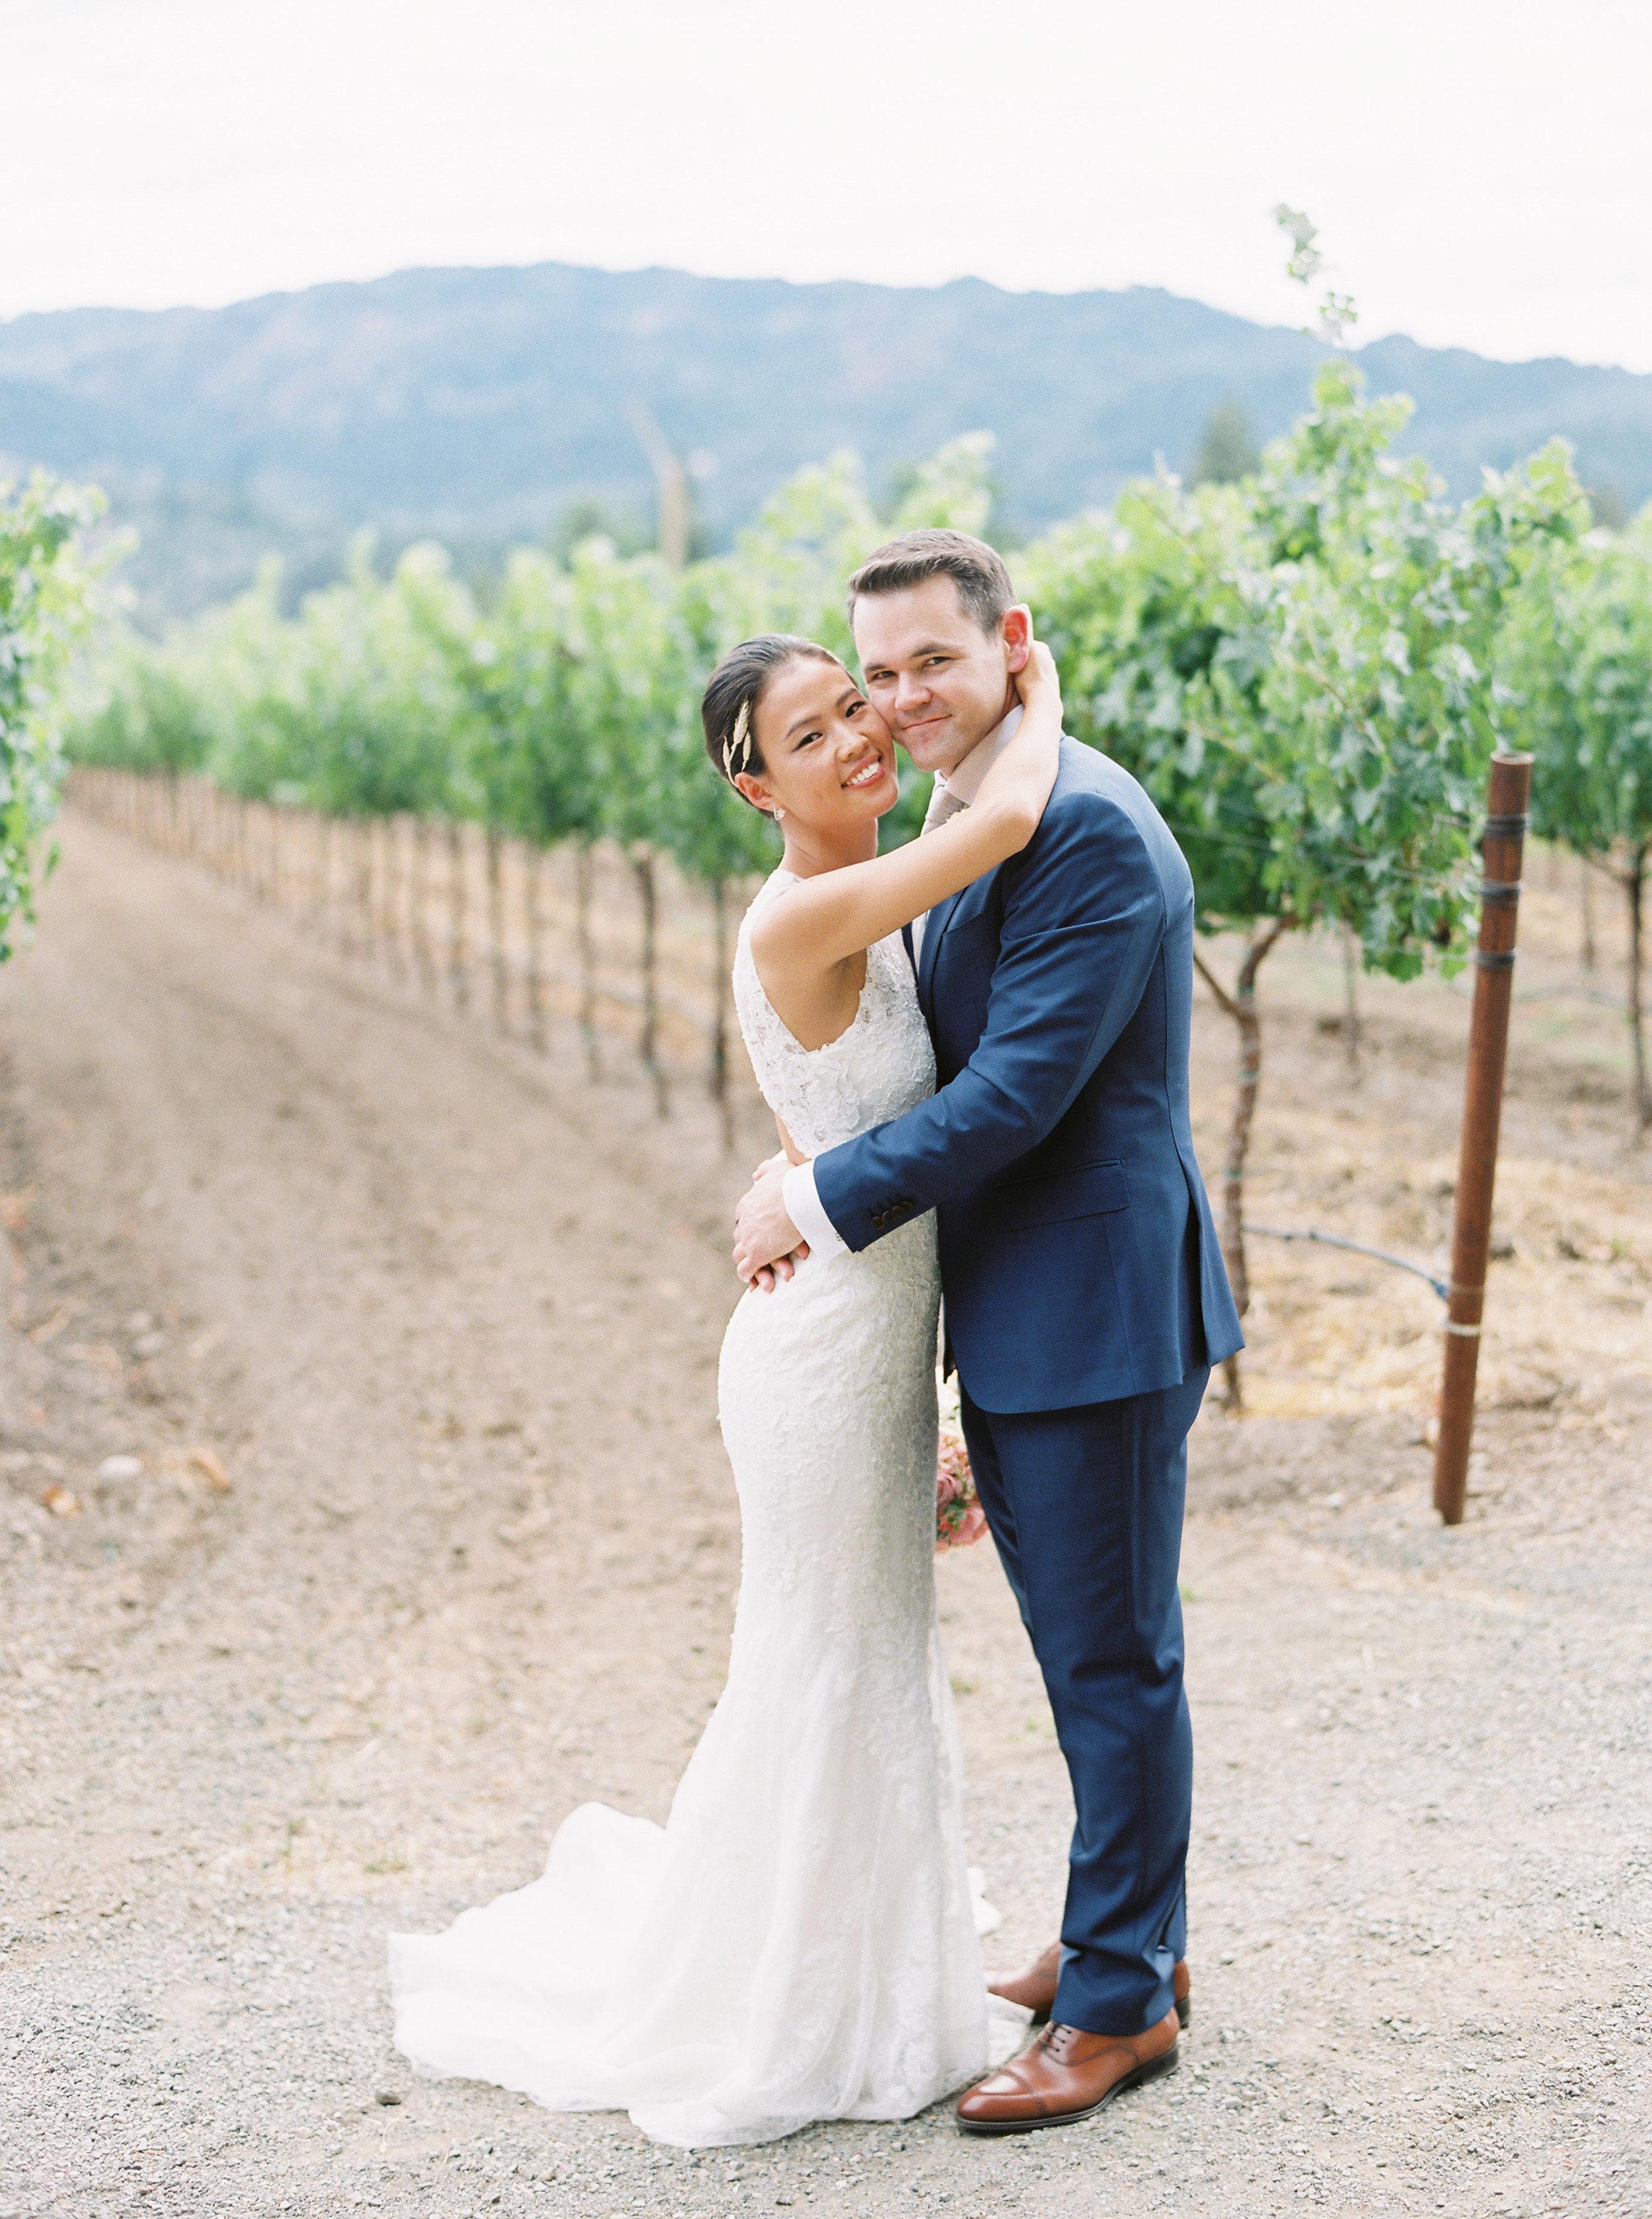 Harvest-inn-wedding-in-napa-california-167.jpg